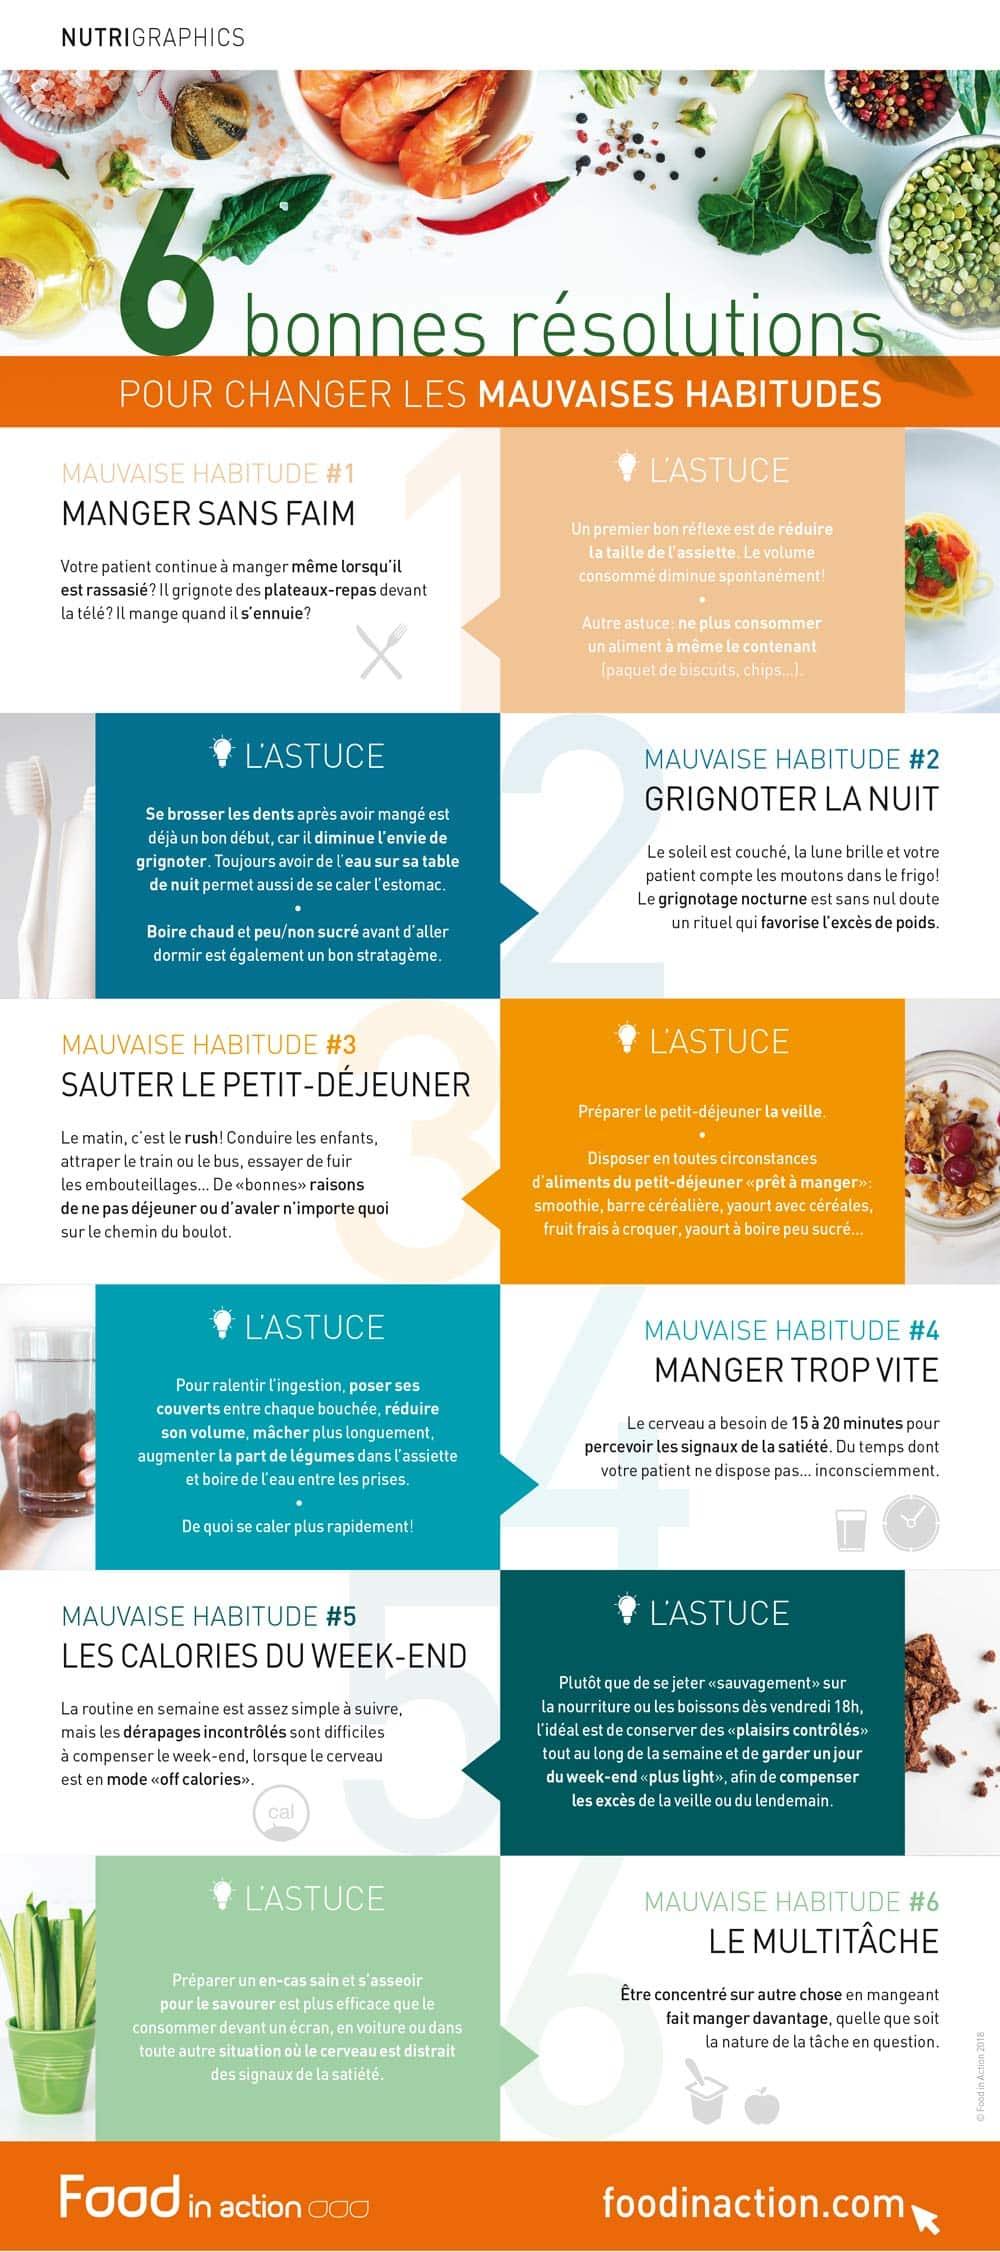 nutrigraphics-resolutions-mauvaises-habitudes